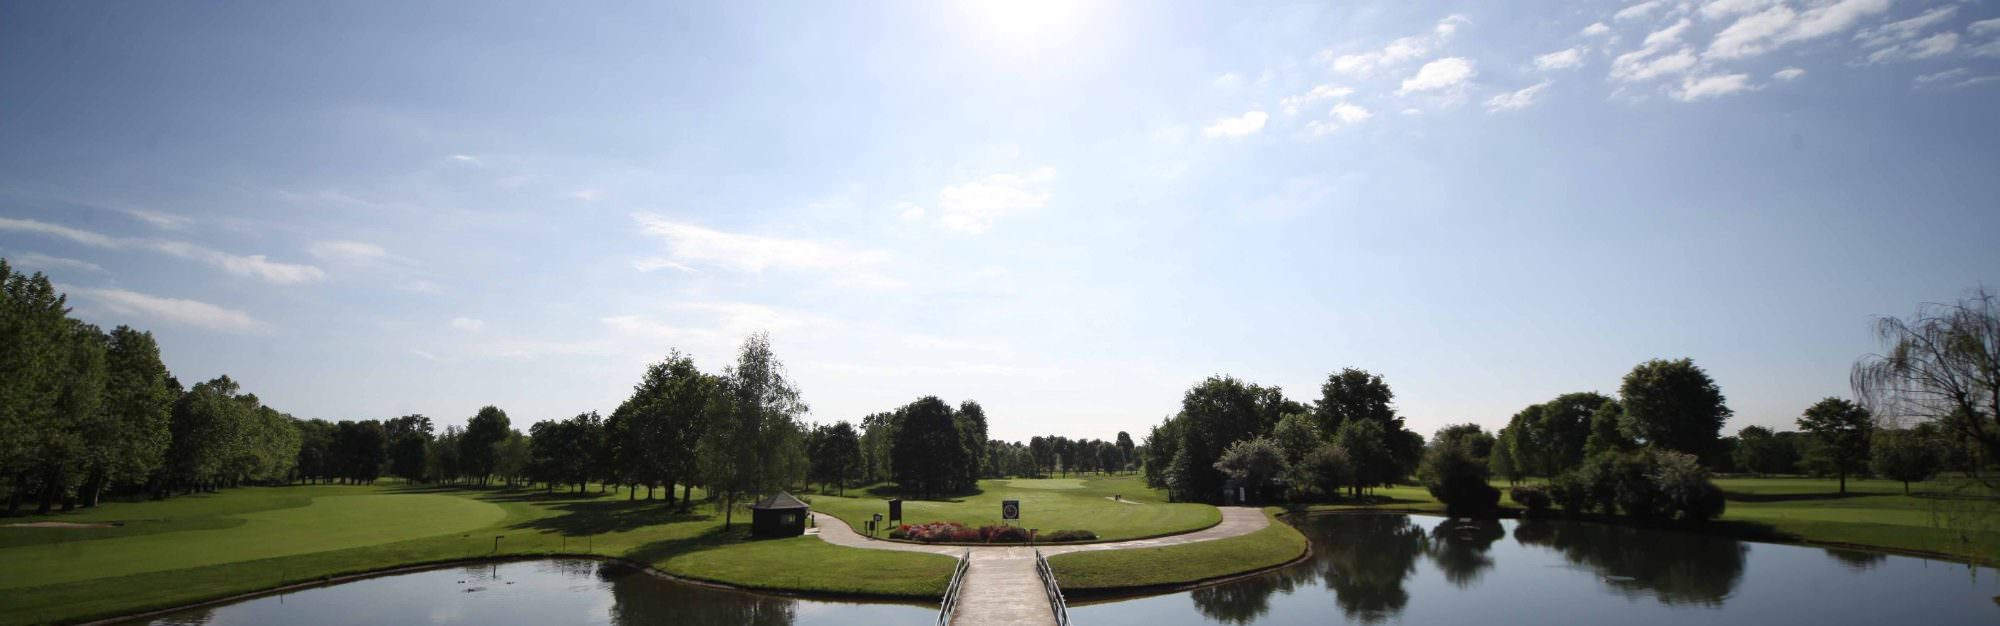 Royal Park (Trent Jones)